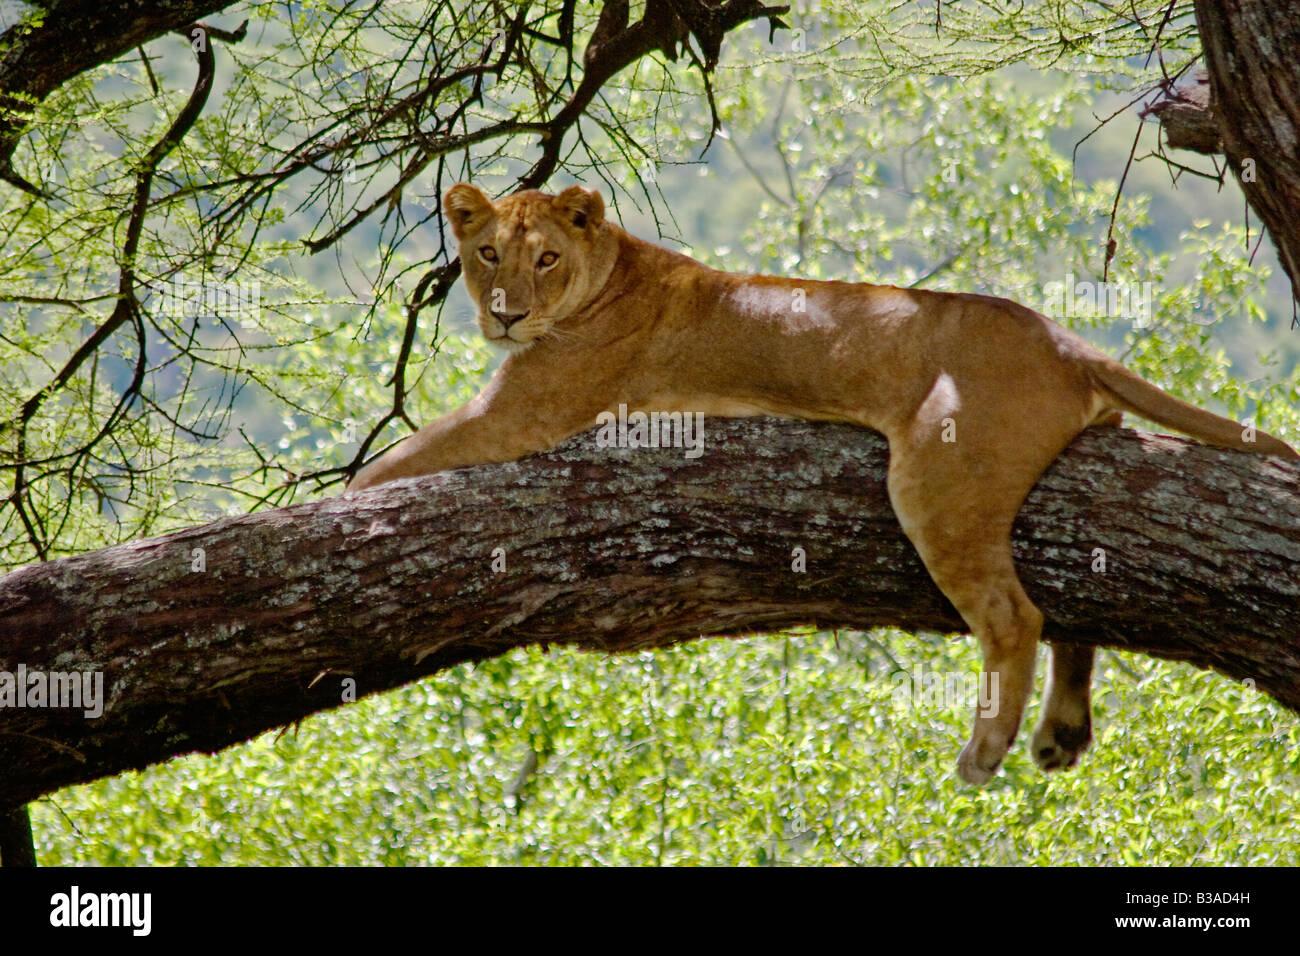 A female LION Panthera leo in a tree LAKE MANYARA NATIONAL PARK TANZANIA - Stock Image